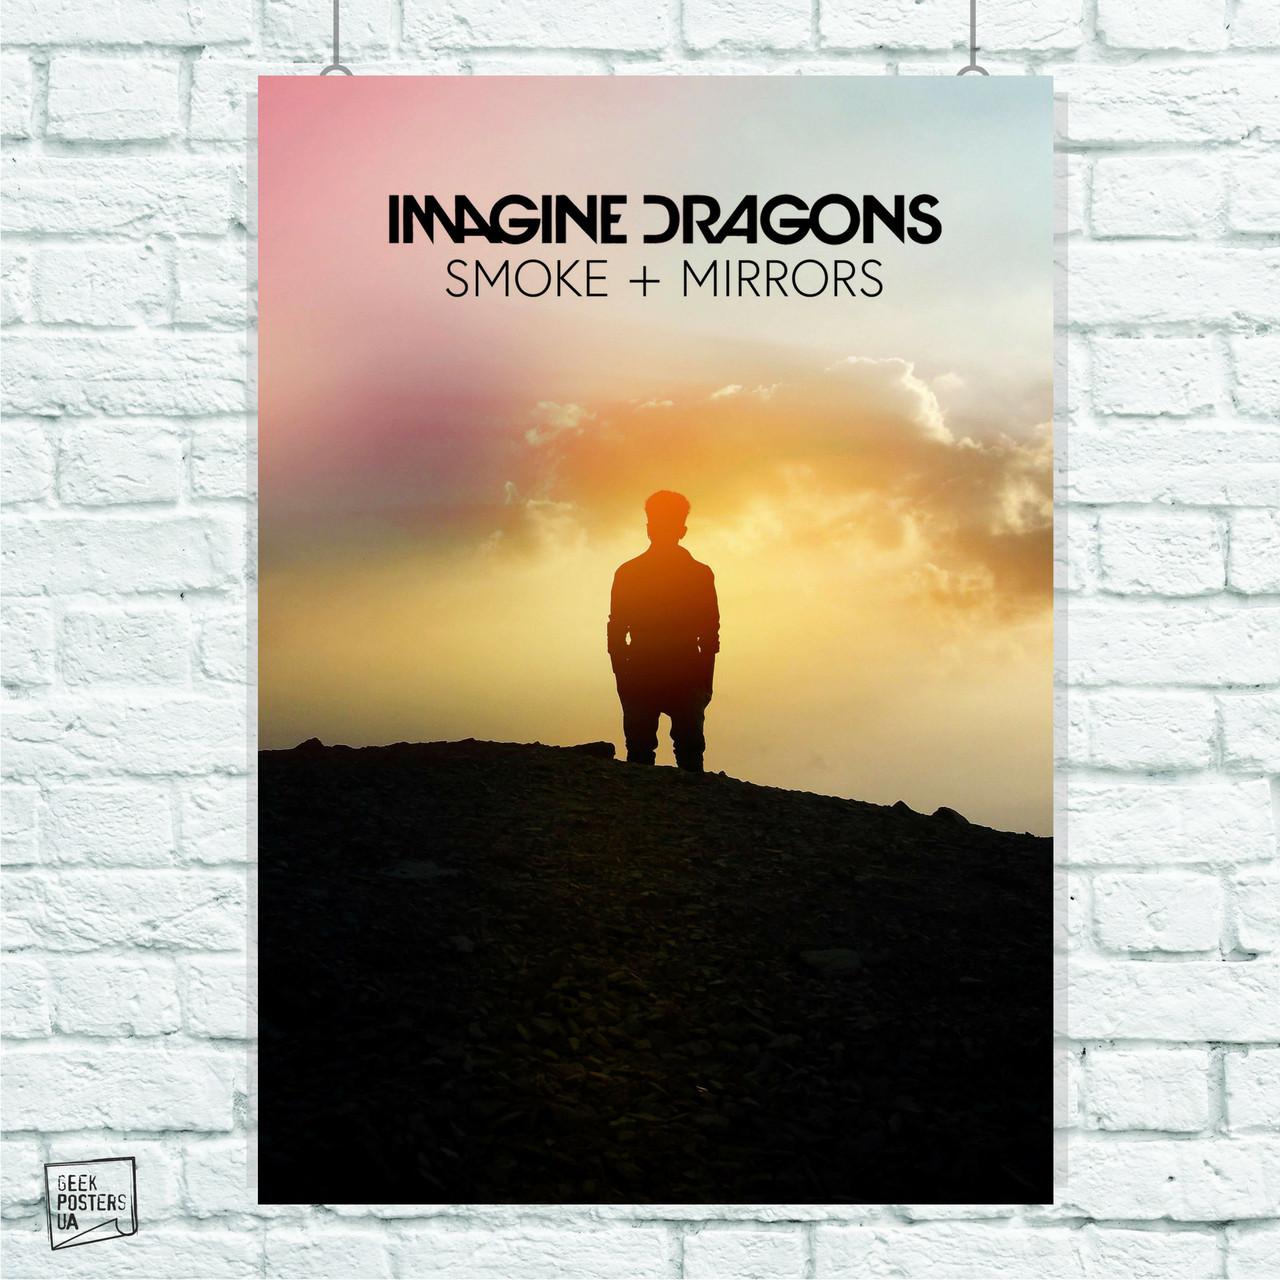 Постер Imagine Dragons (обложка, Smore+Mirrors). Размер 60x42см (A2). Глянцевая бумага